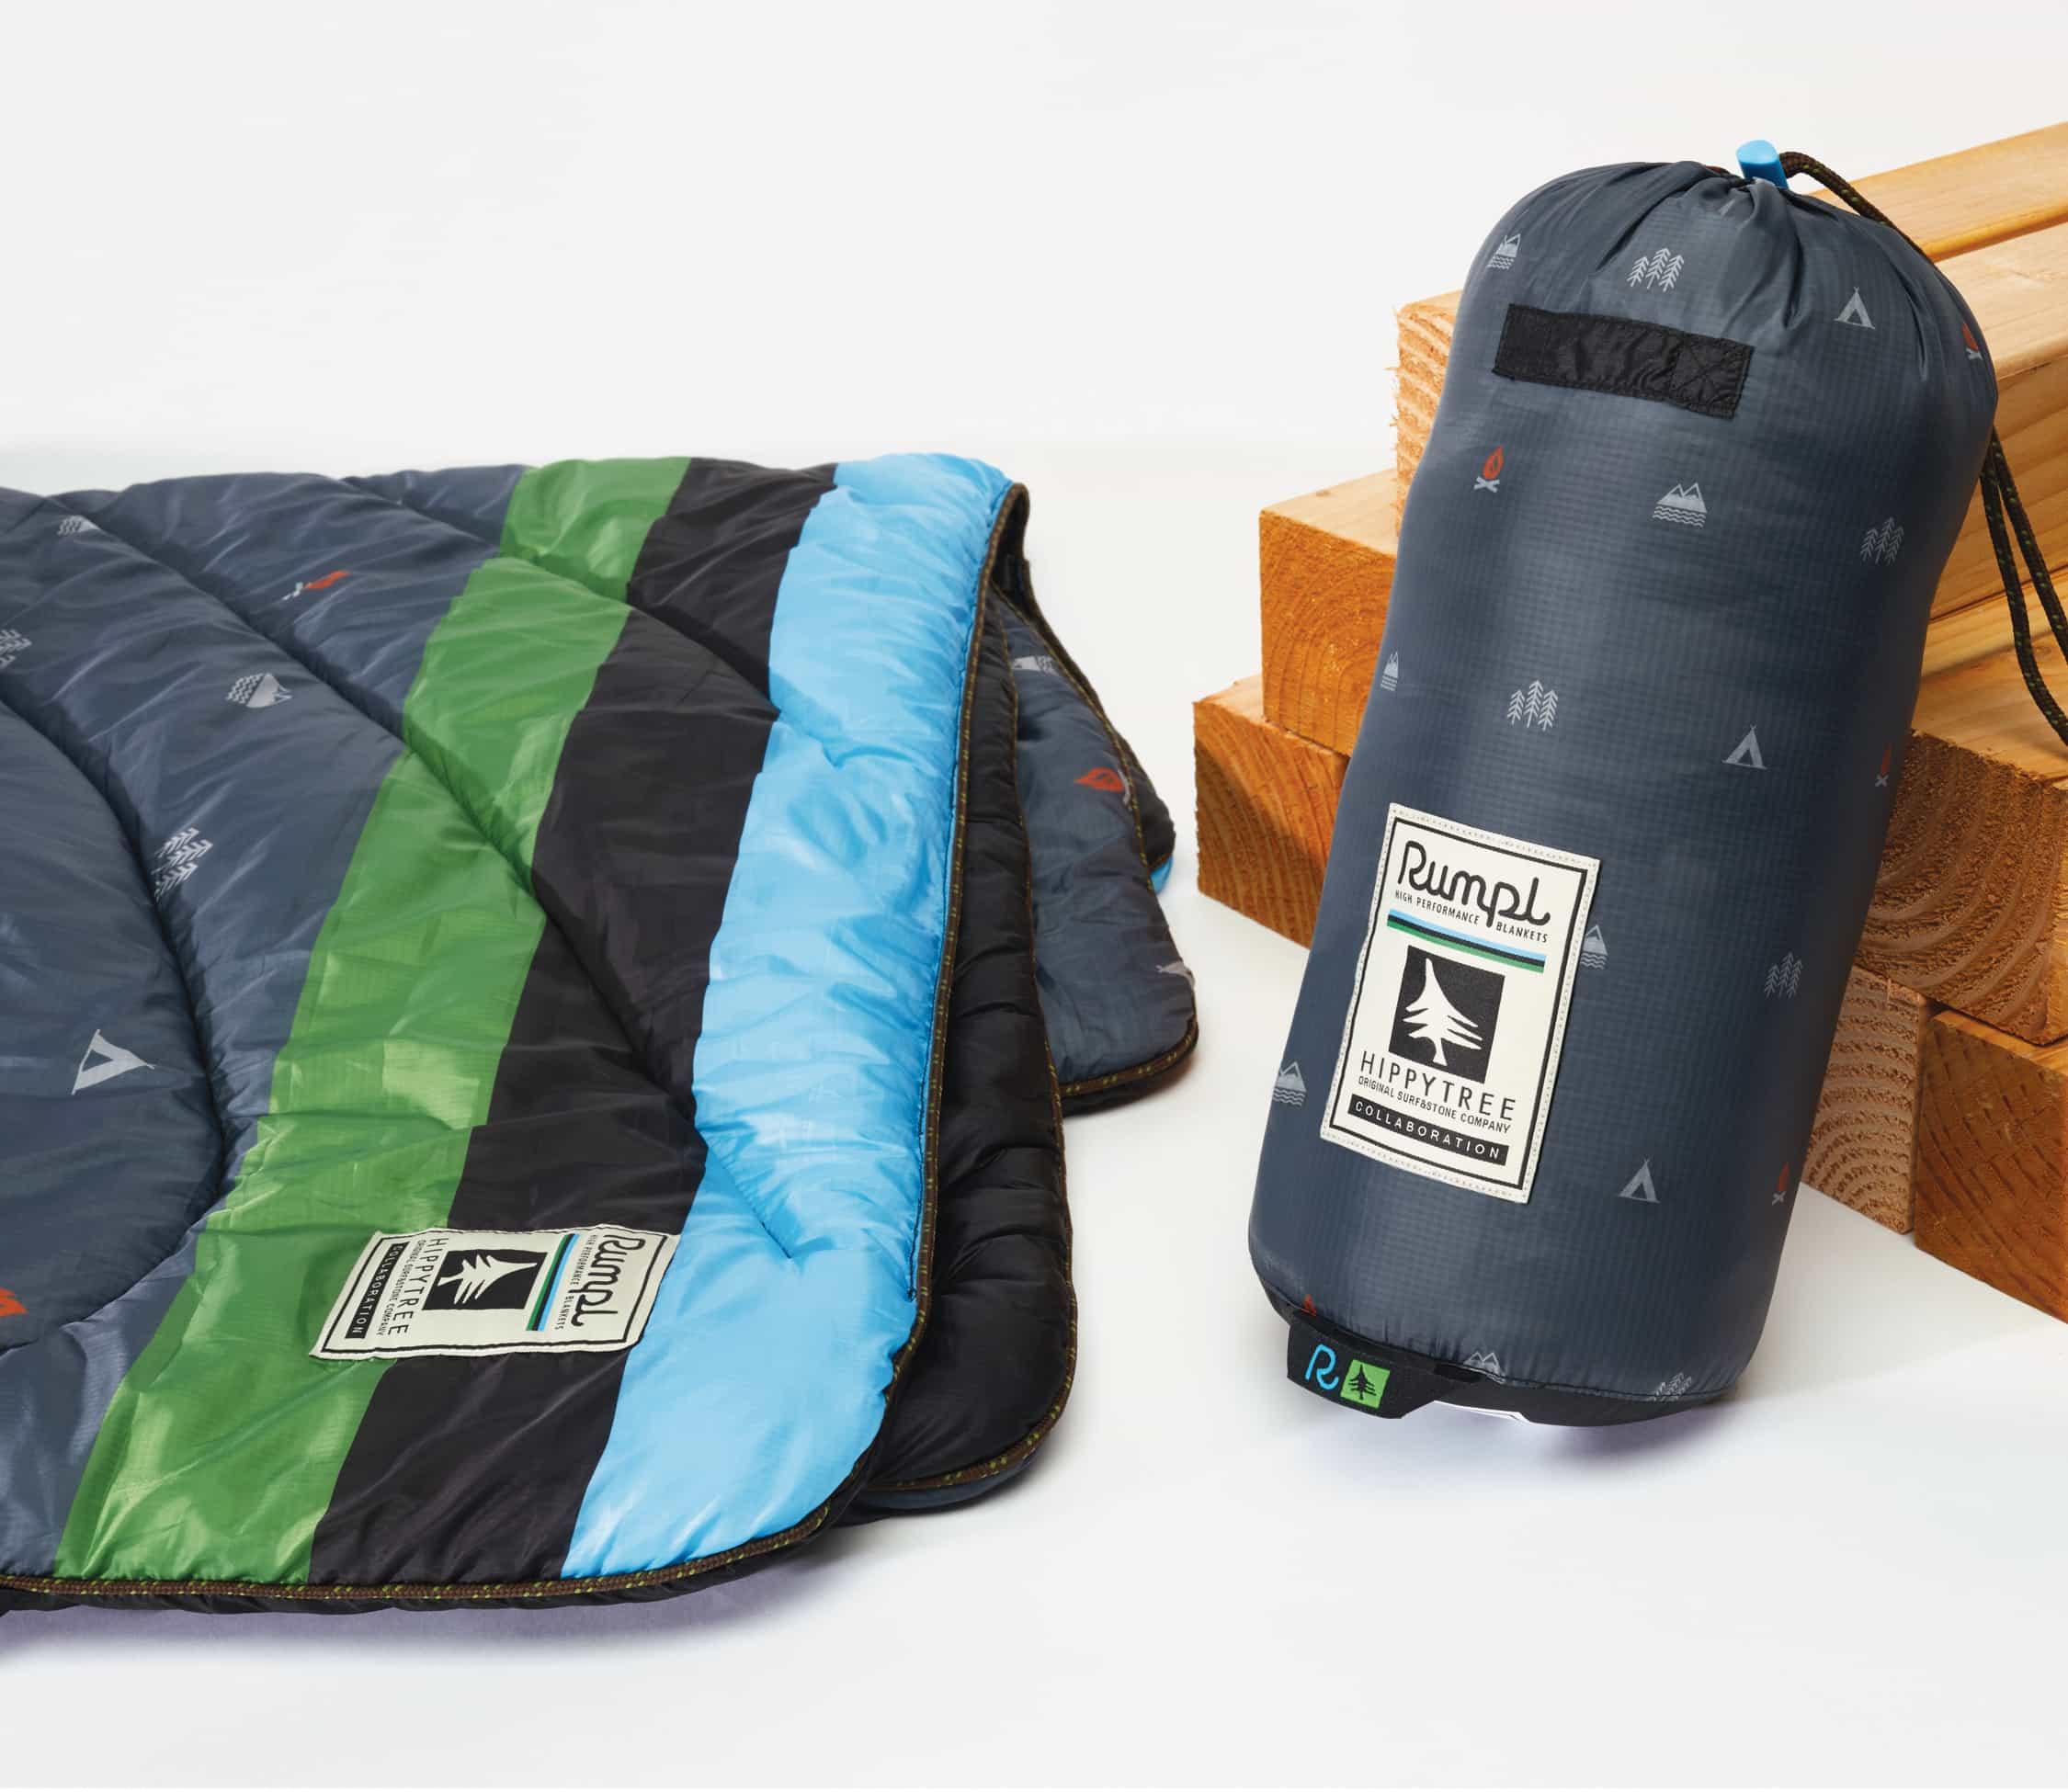 2138 rumpl legends hero 02 highres - The Rumpl Hippy Tree Puffy Blanket – Camping Essential